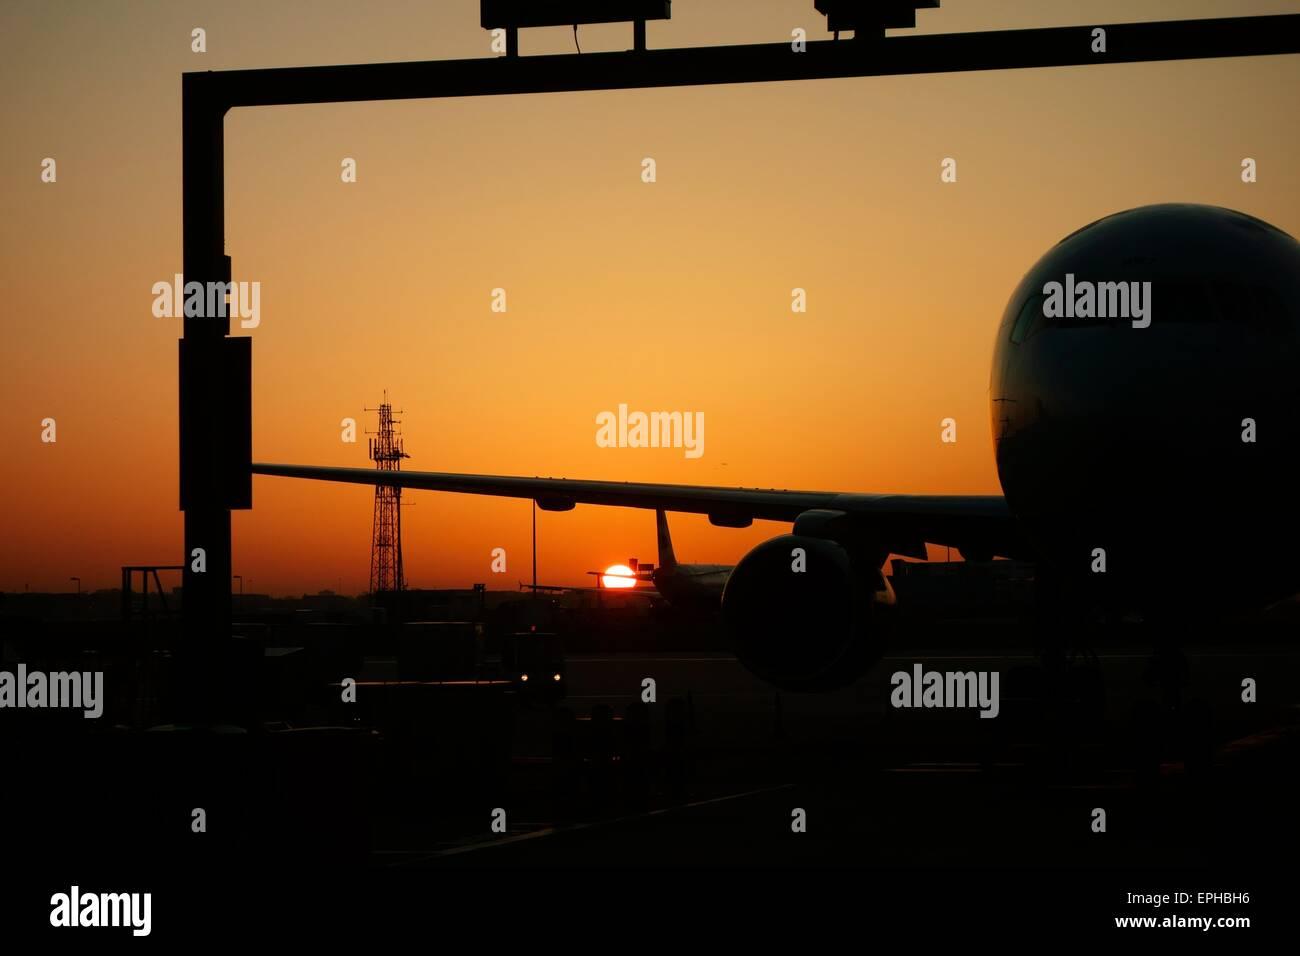 Sunrise over Heathrow Airport - Stock Image